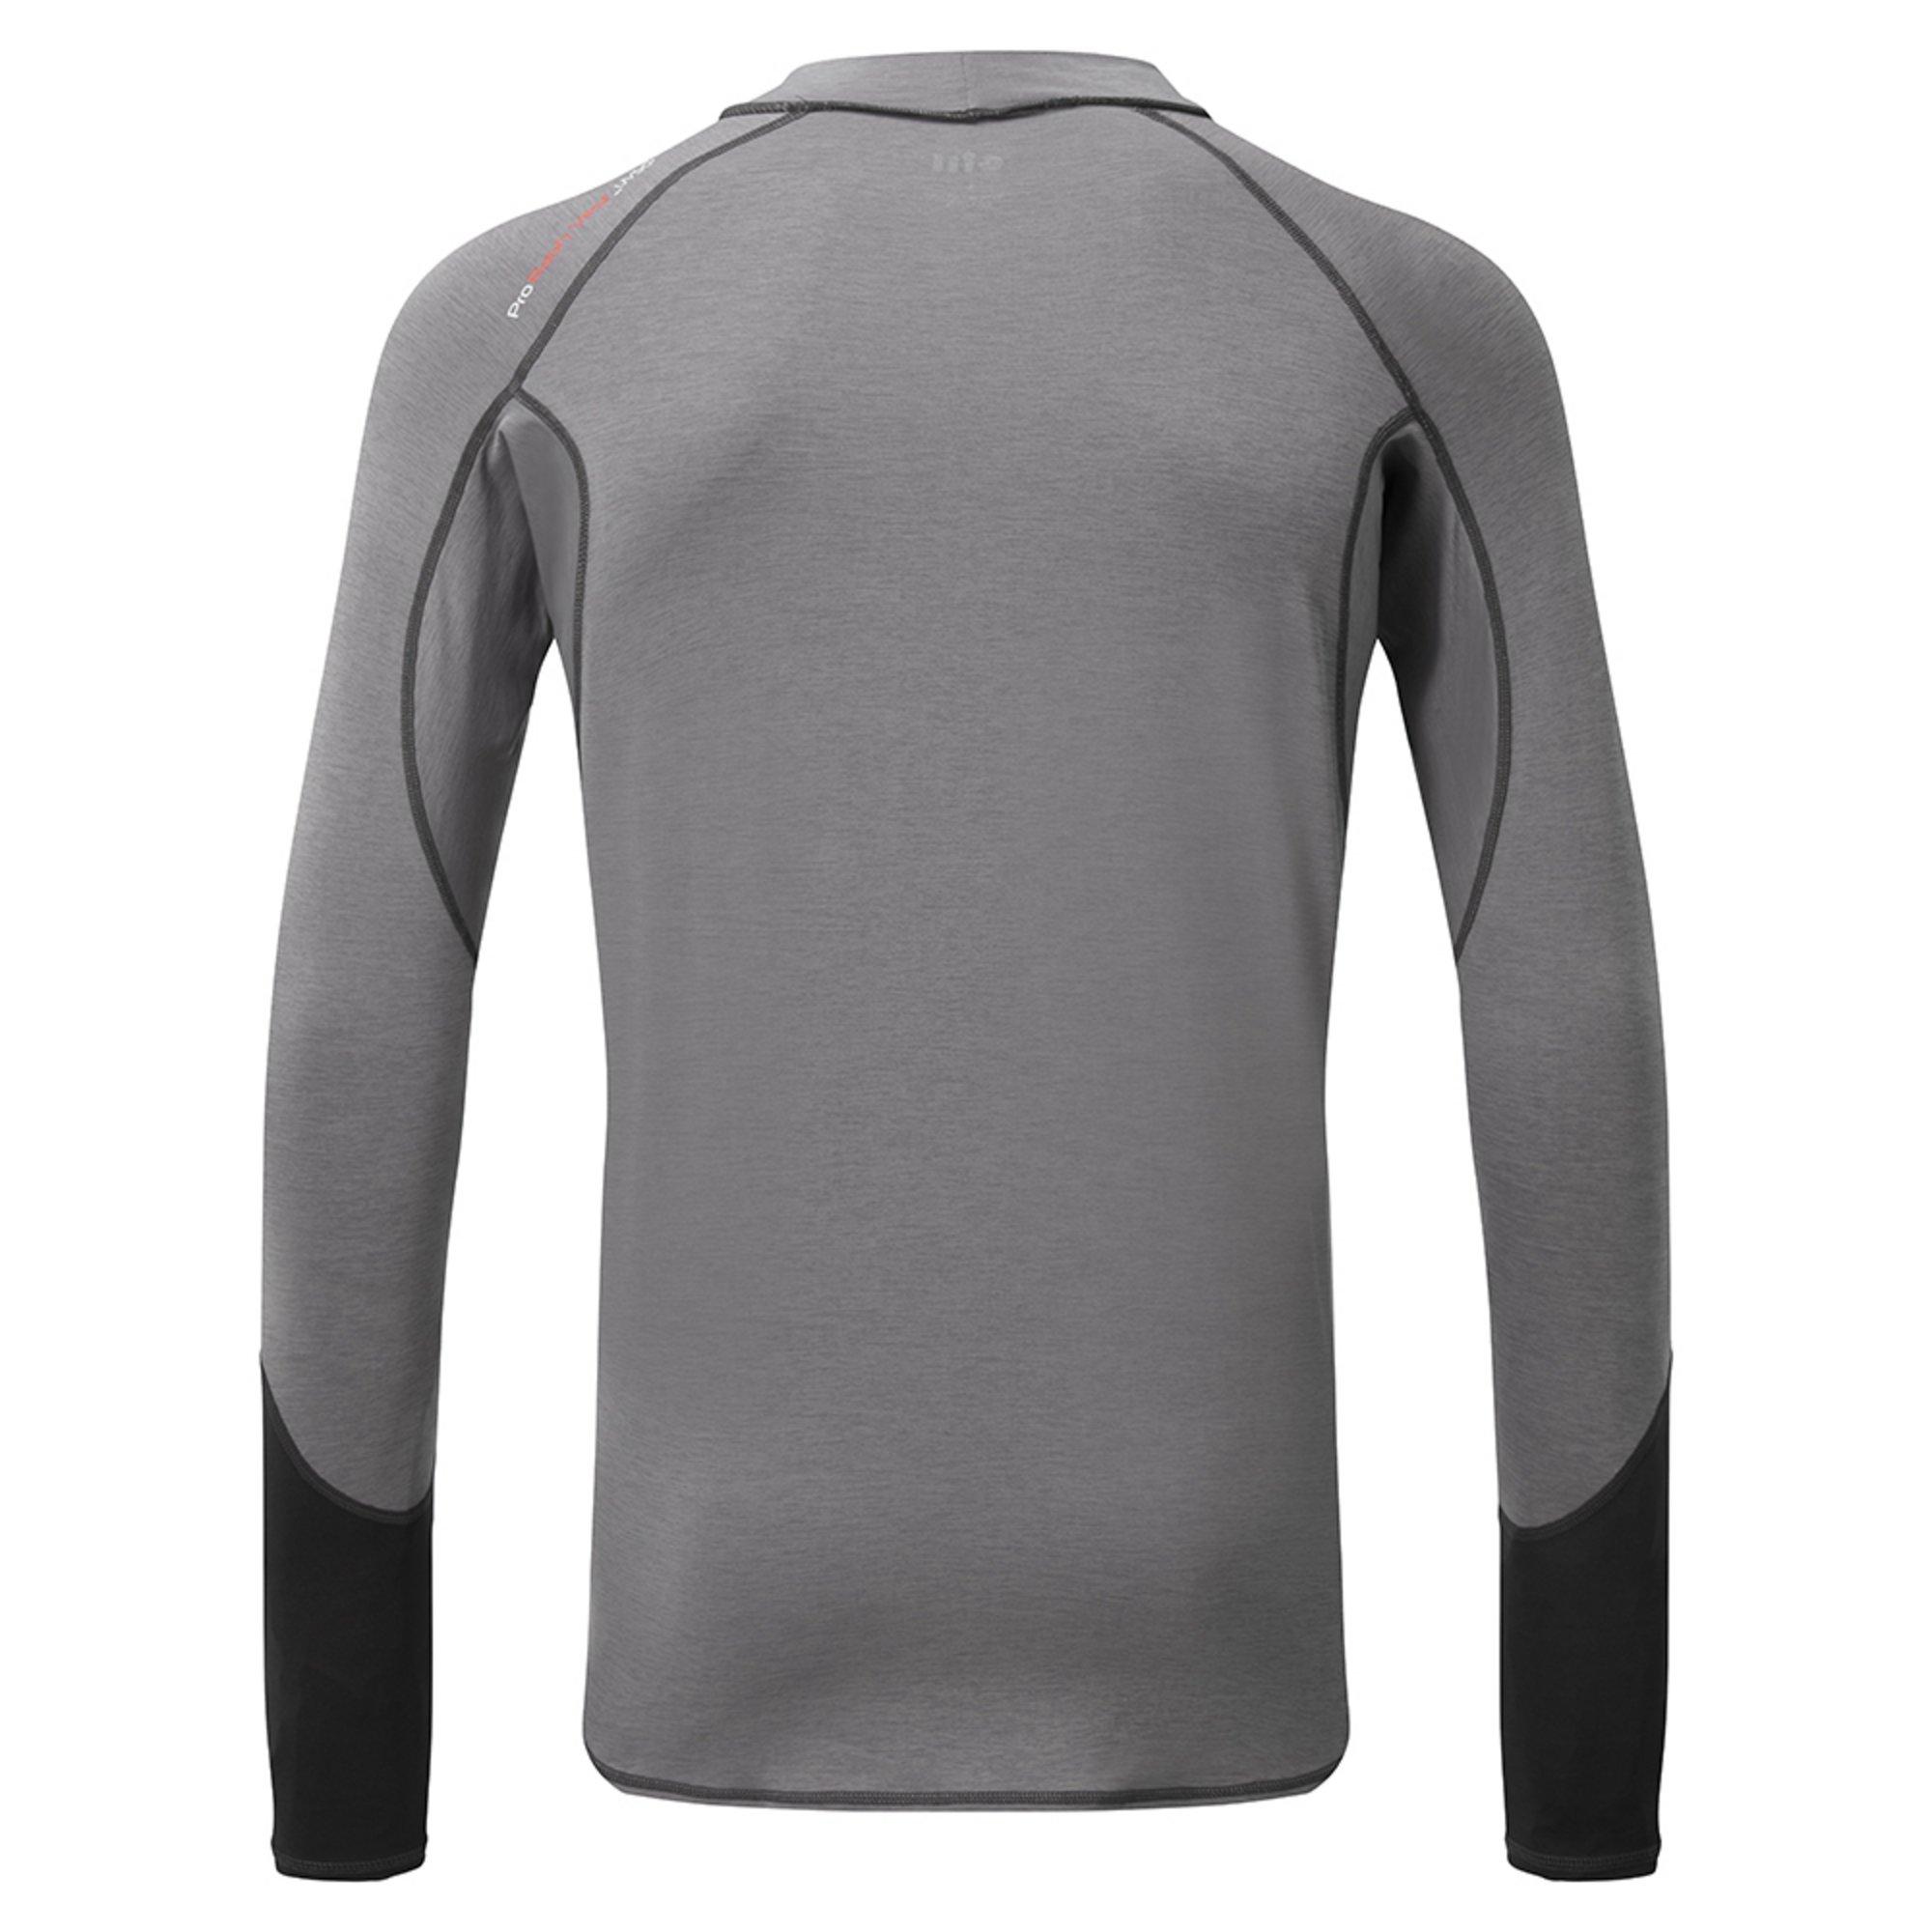 Men's Eco Pro Rash Vest - Long Sleeve - 5025-GRE18_2.jpg